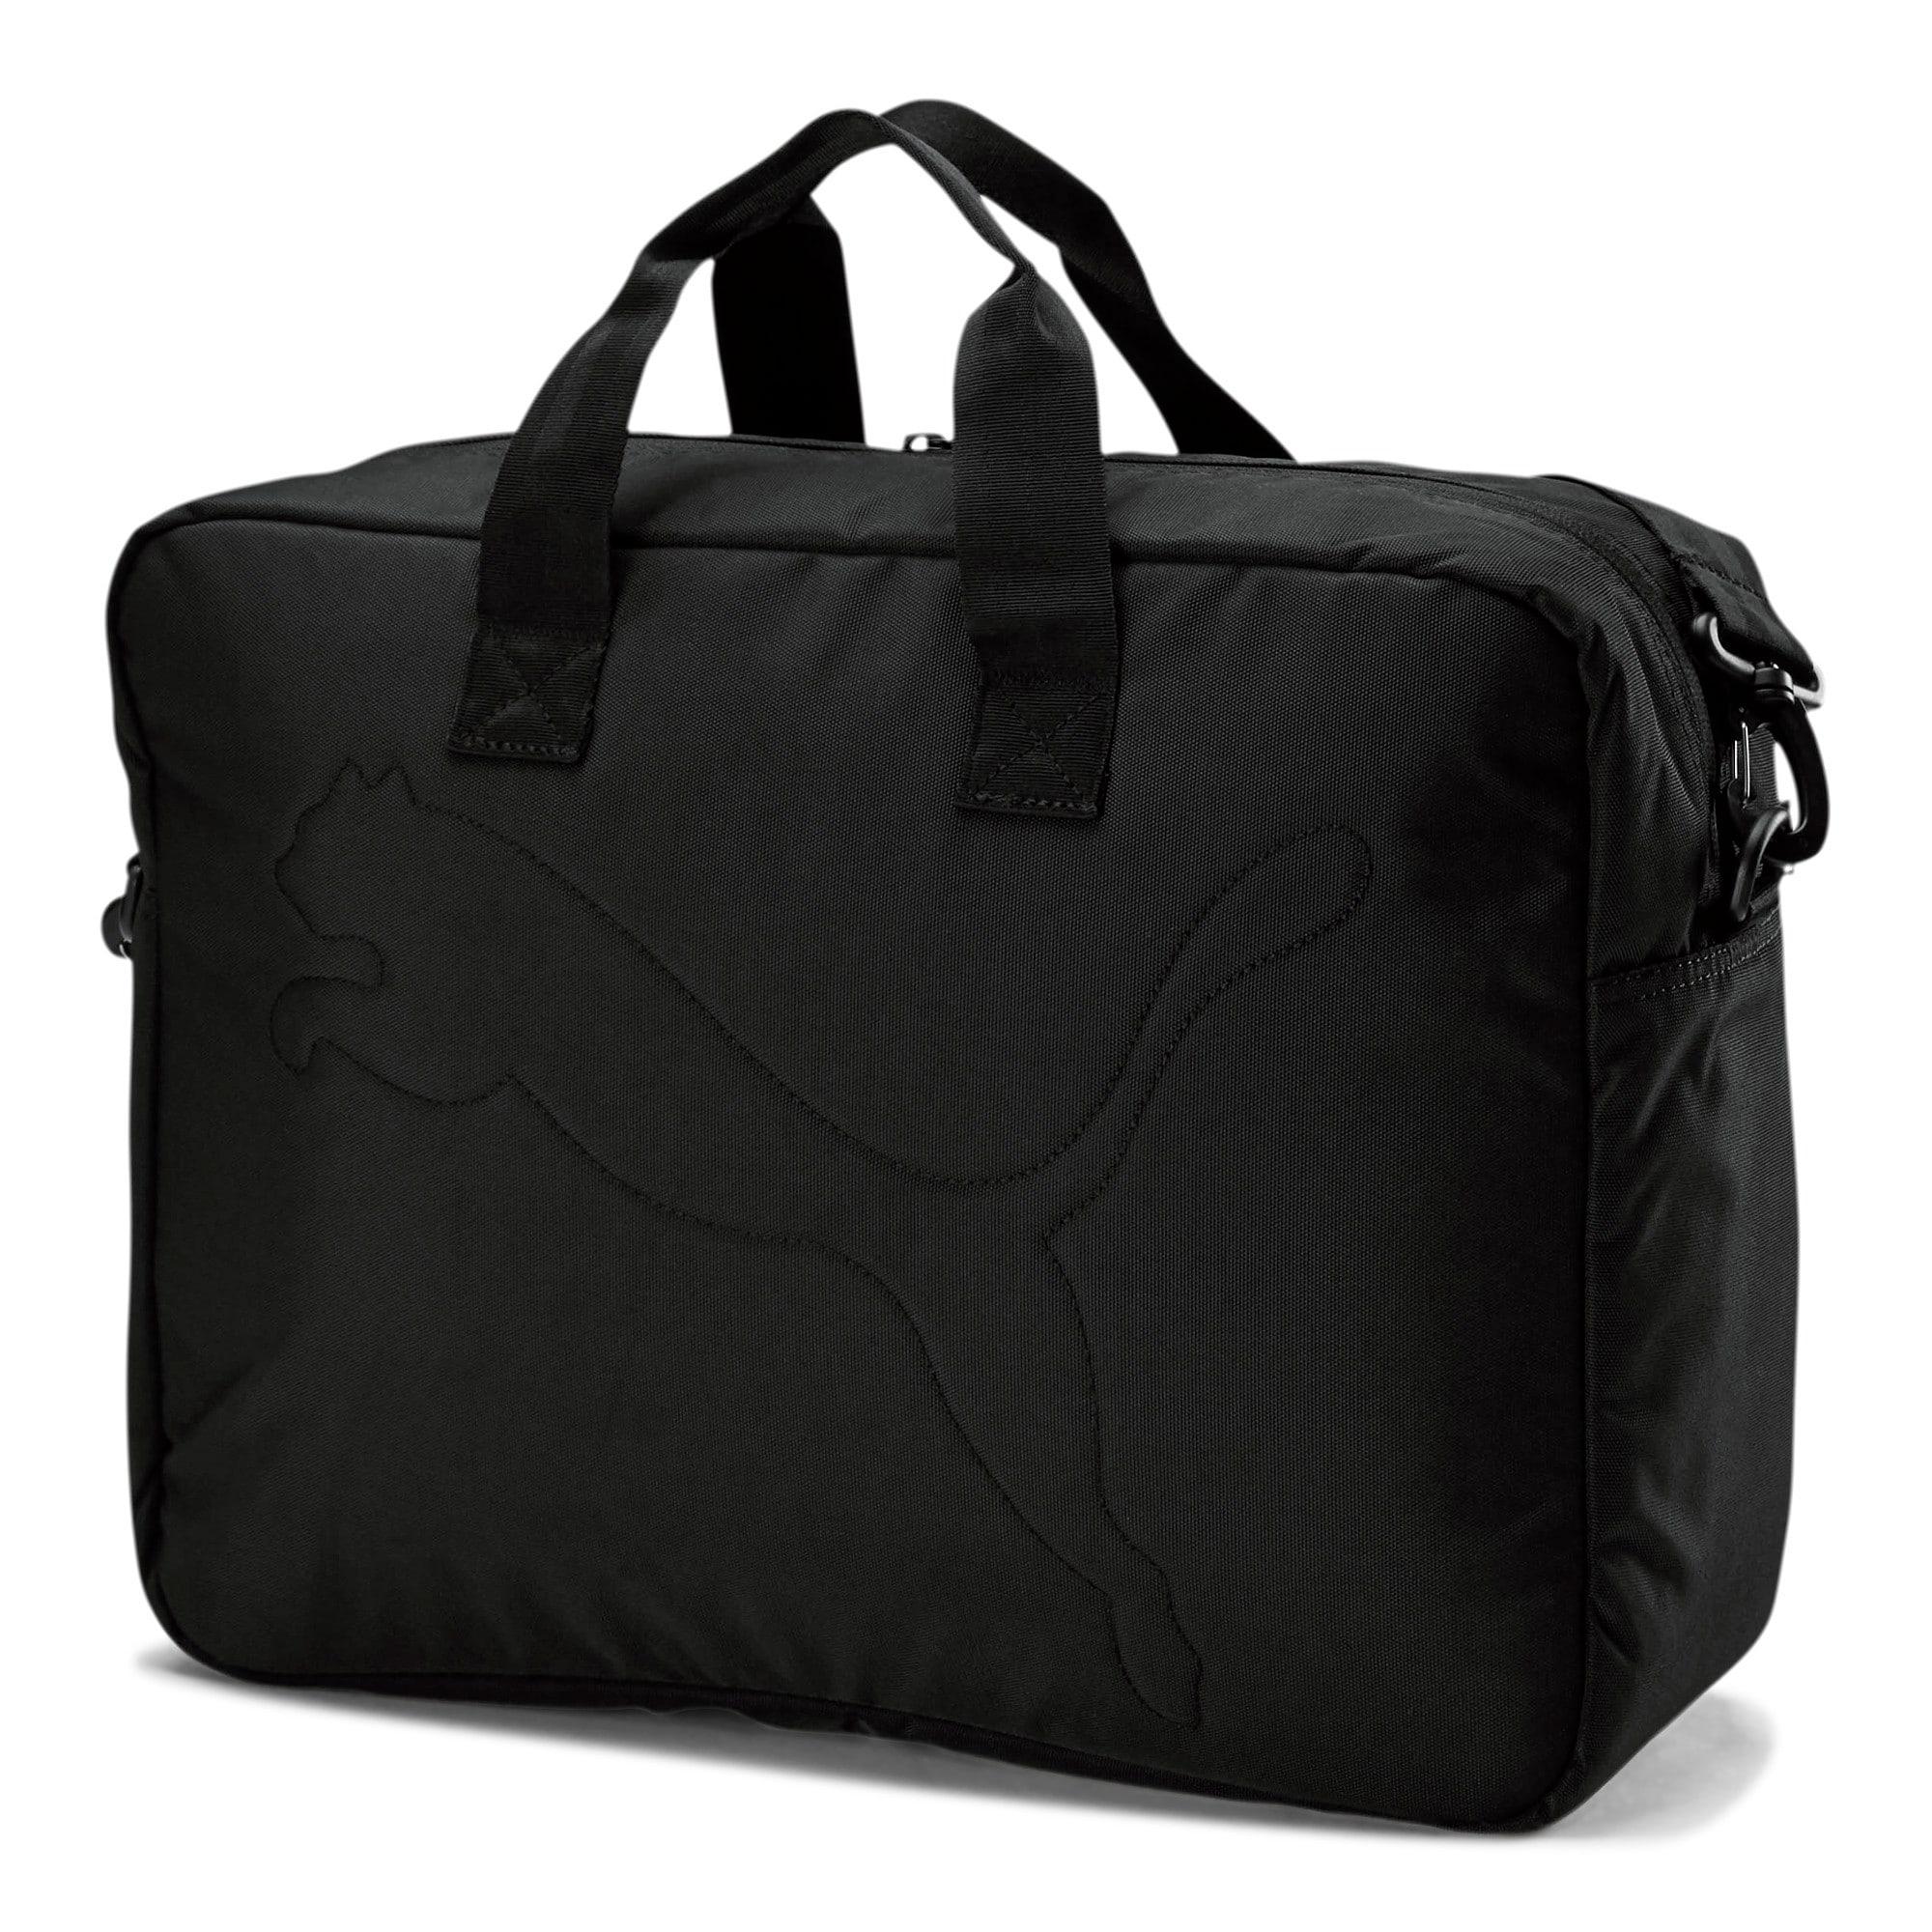 Thumbnail 2 of Revision Messenger Bag, Black, medium